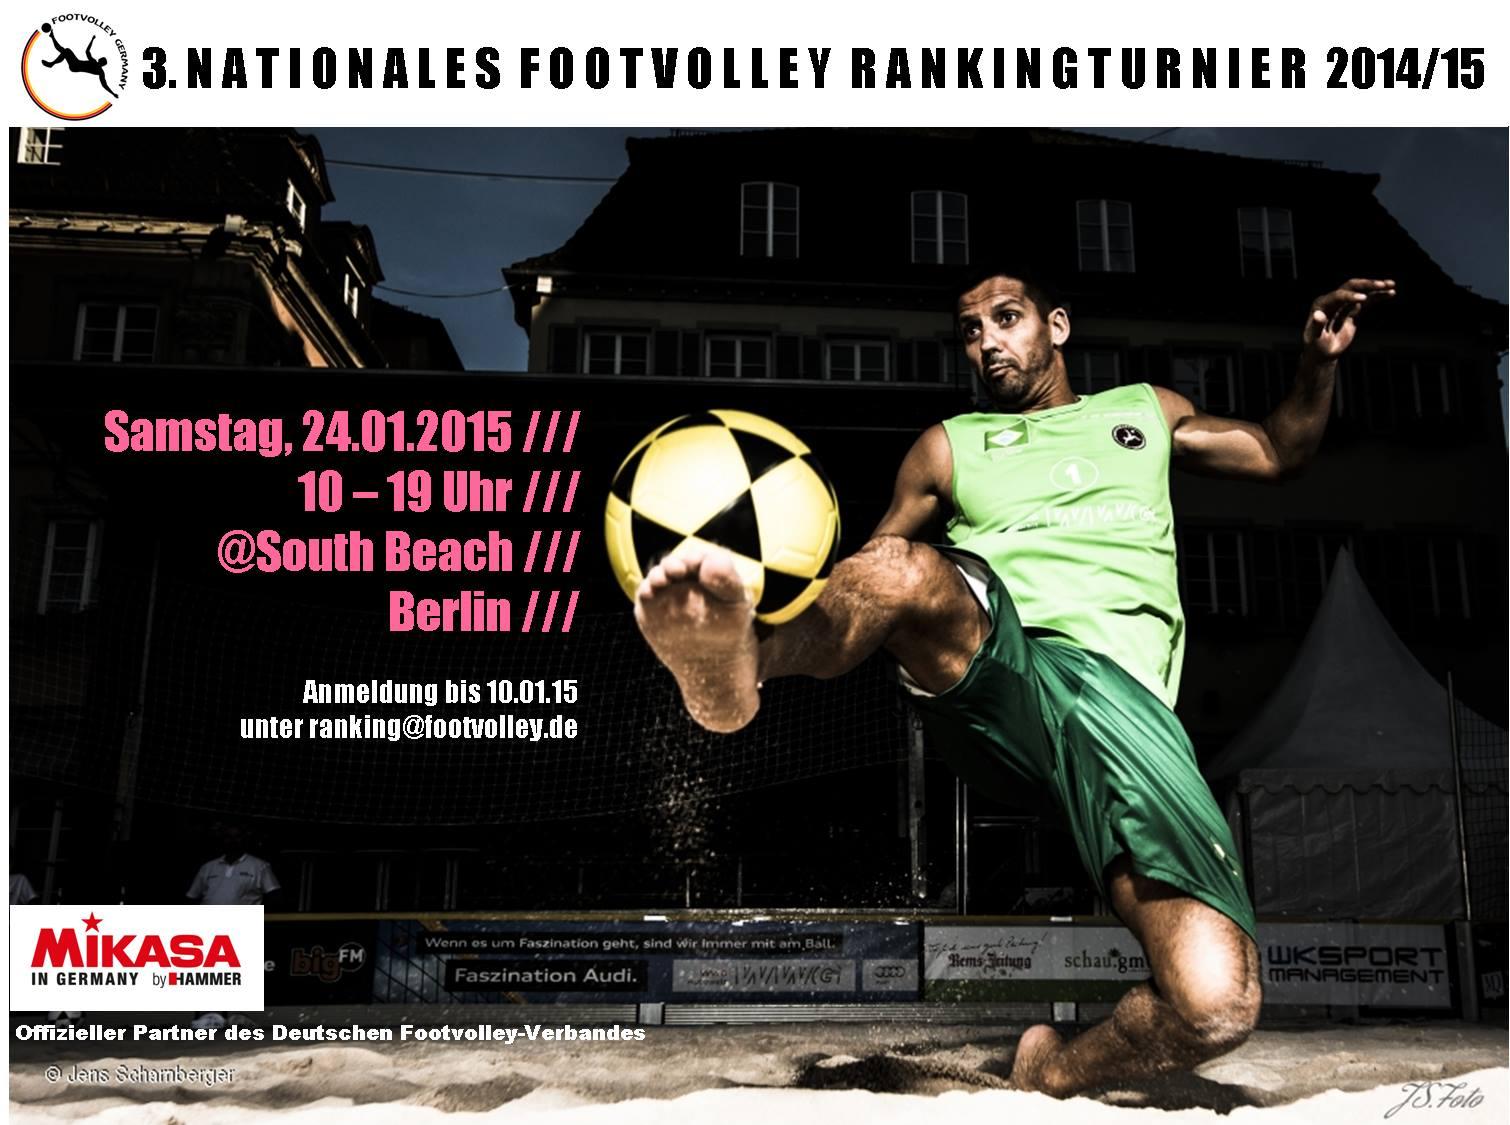 3. Footvolley-Ranking 2014/2015 – Berlin